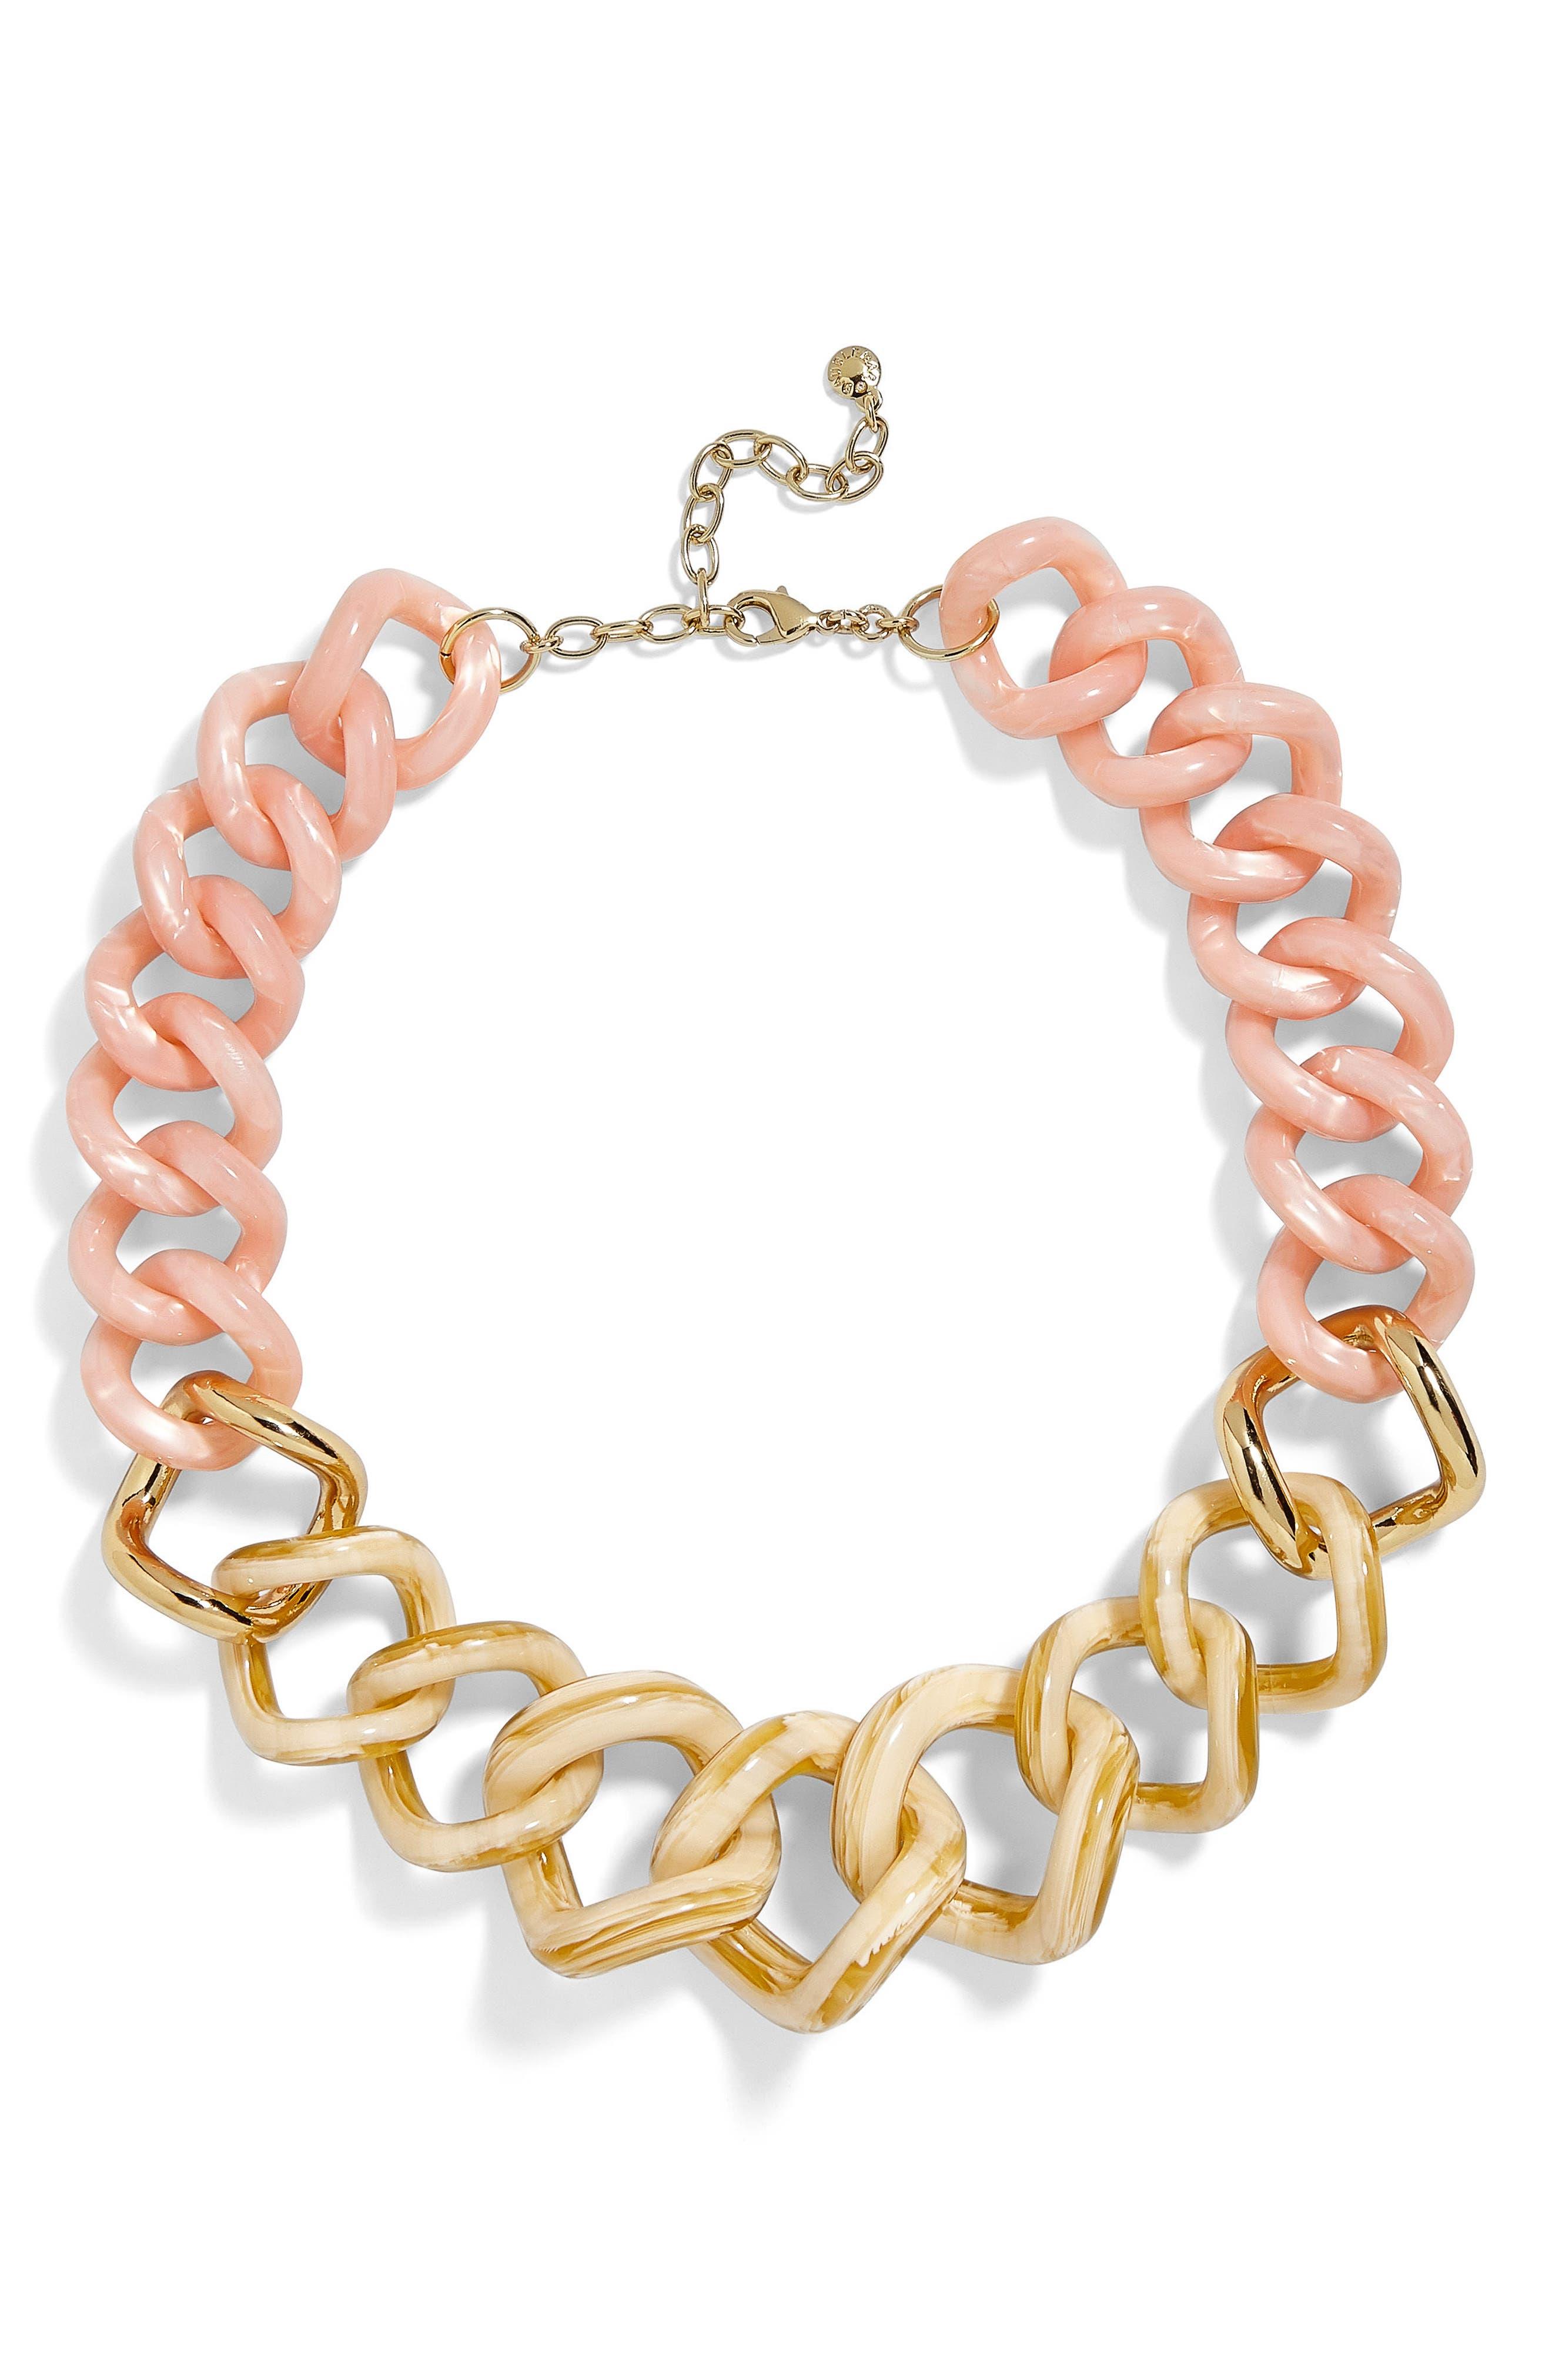 BaubleBar Francina Large Acrylic Link Necklace